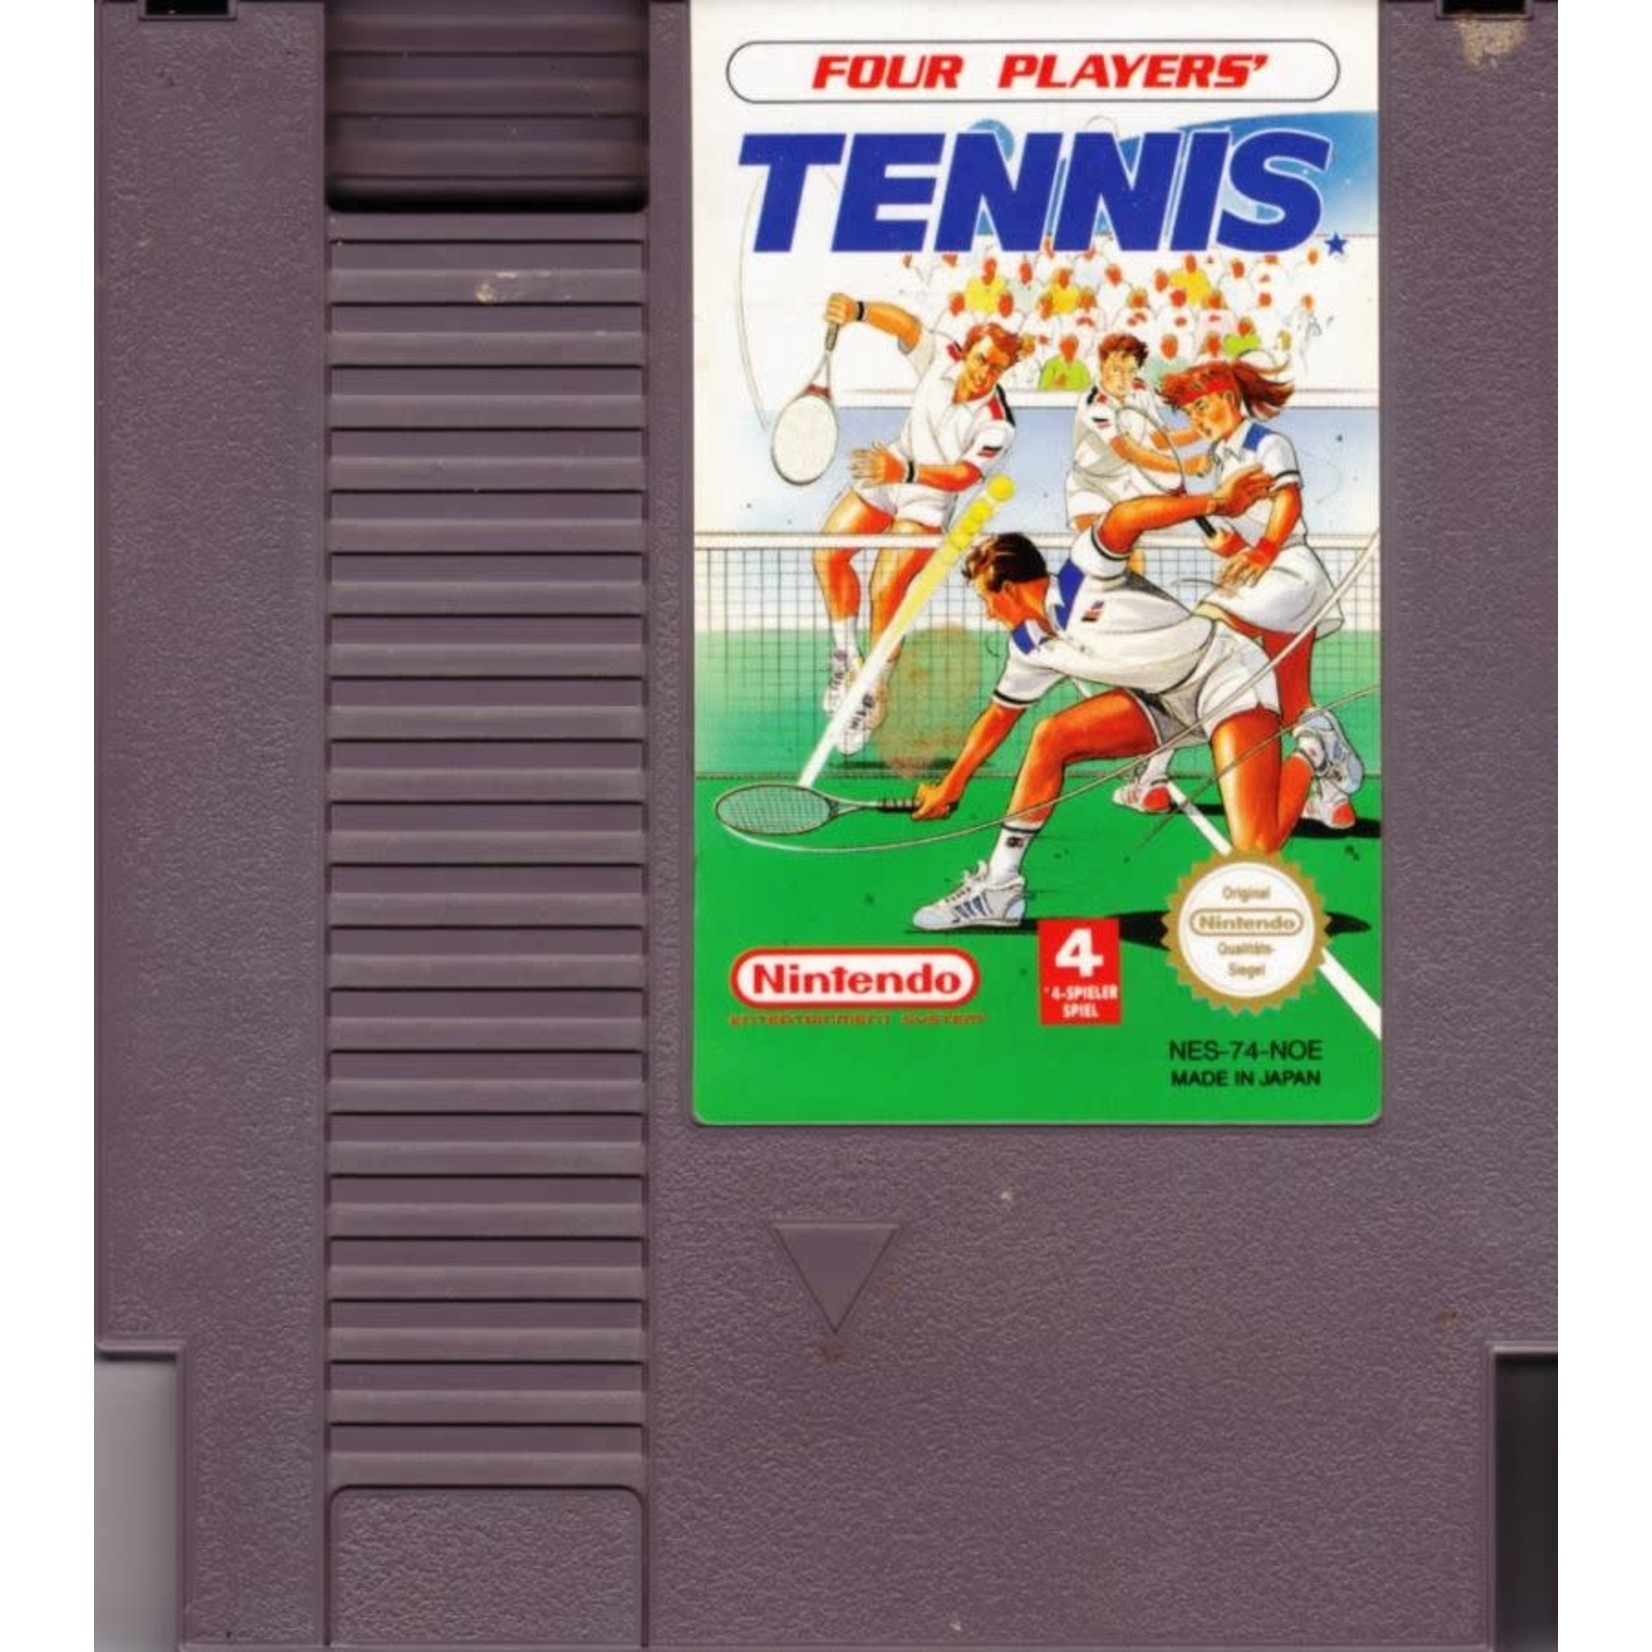 NESU-TOP PLAYERS TENNIS (CARTRIDGE)